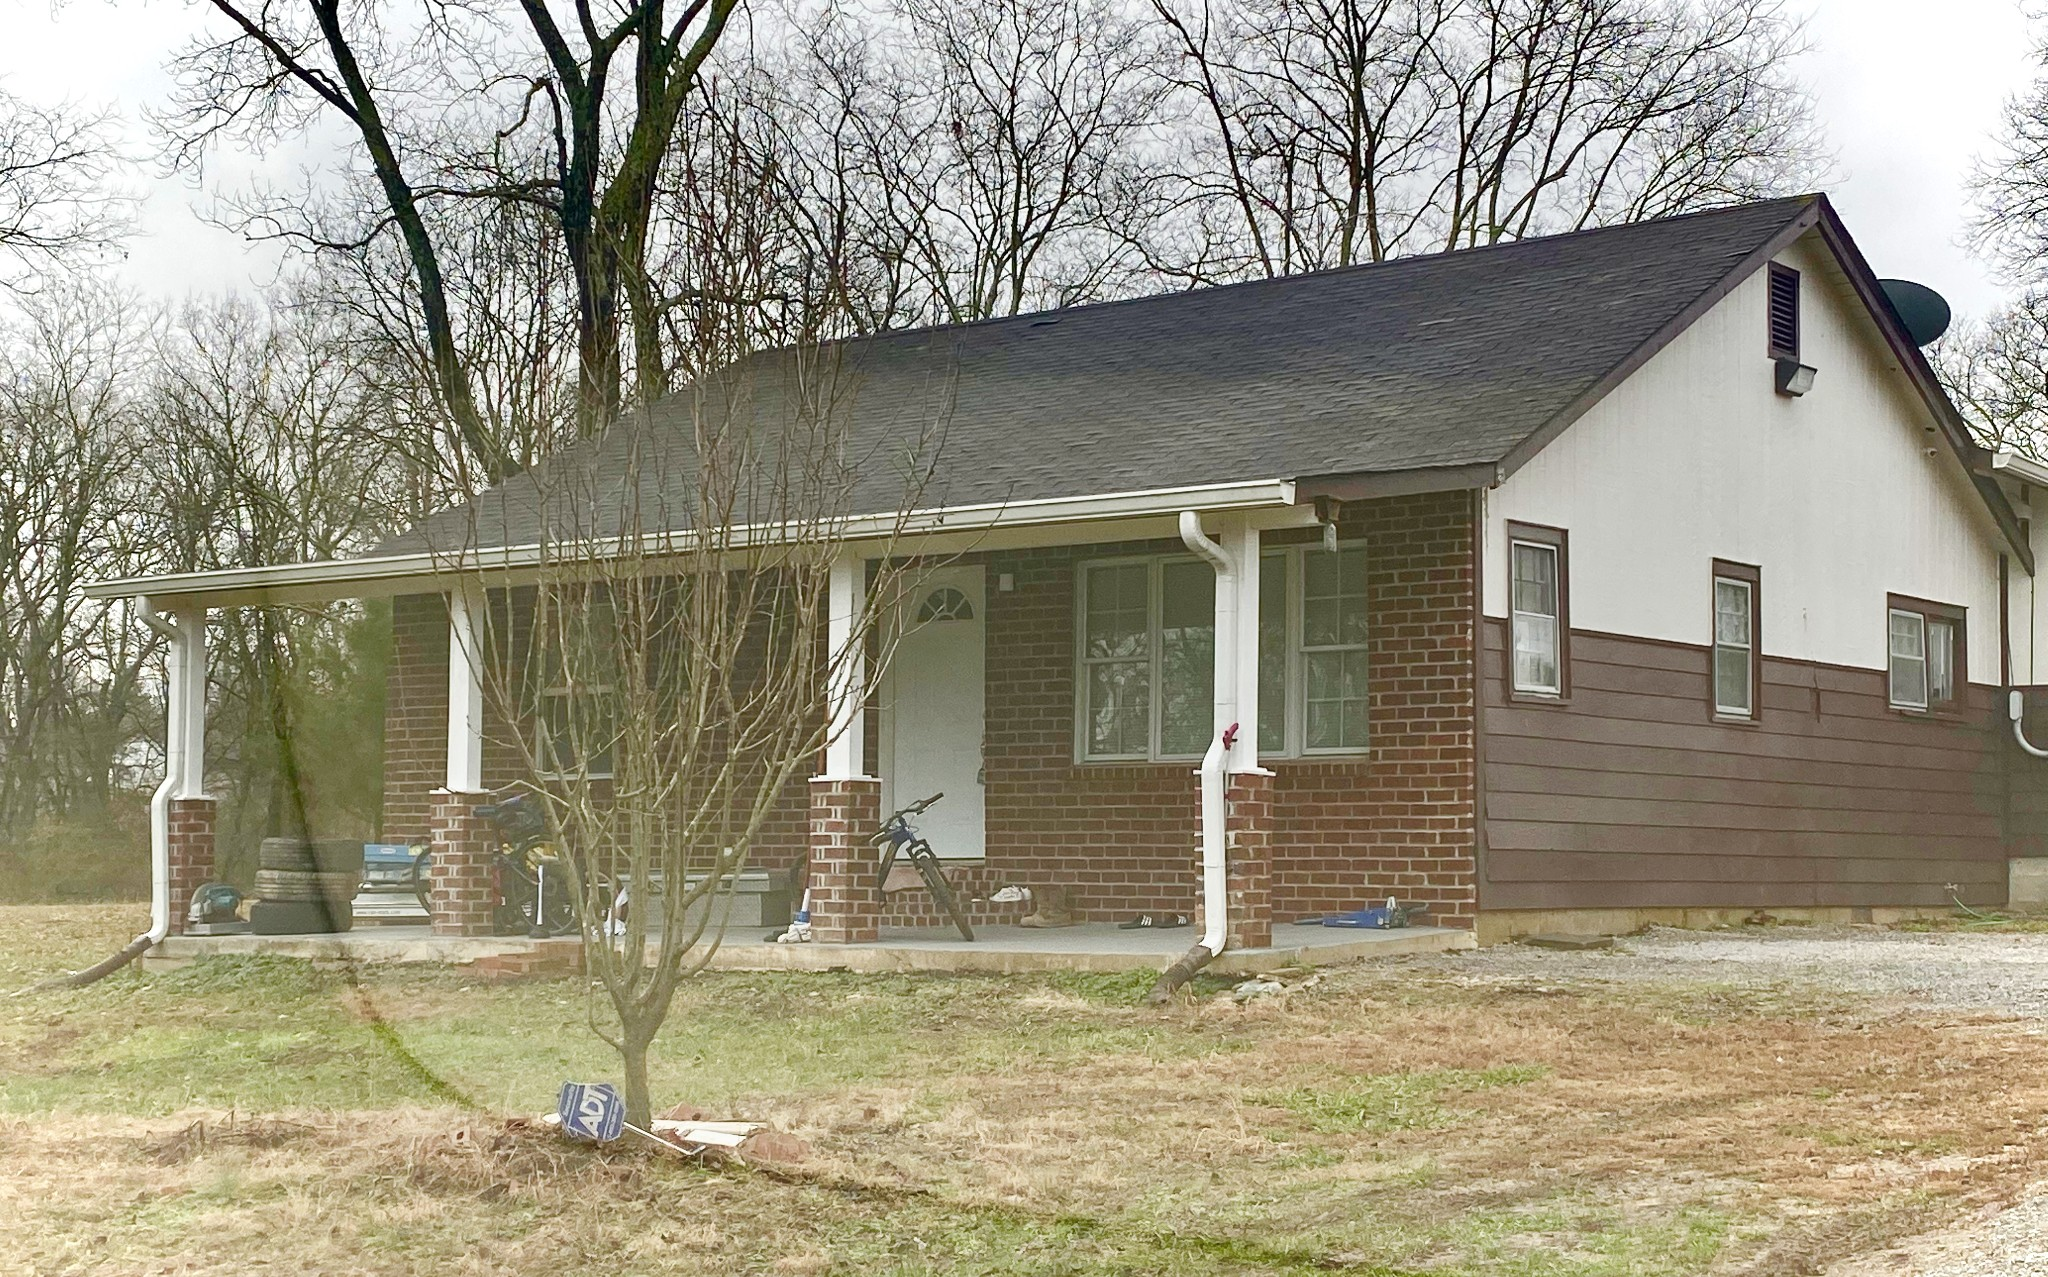 578 Ewing Dr, Nashville, TN 37207 - Nashville, TN real estate listing